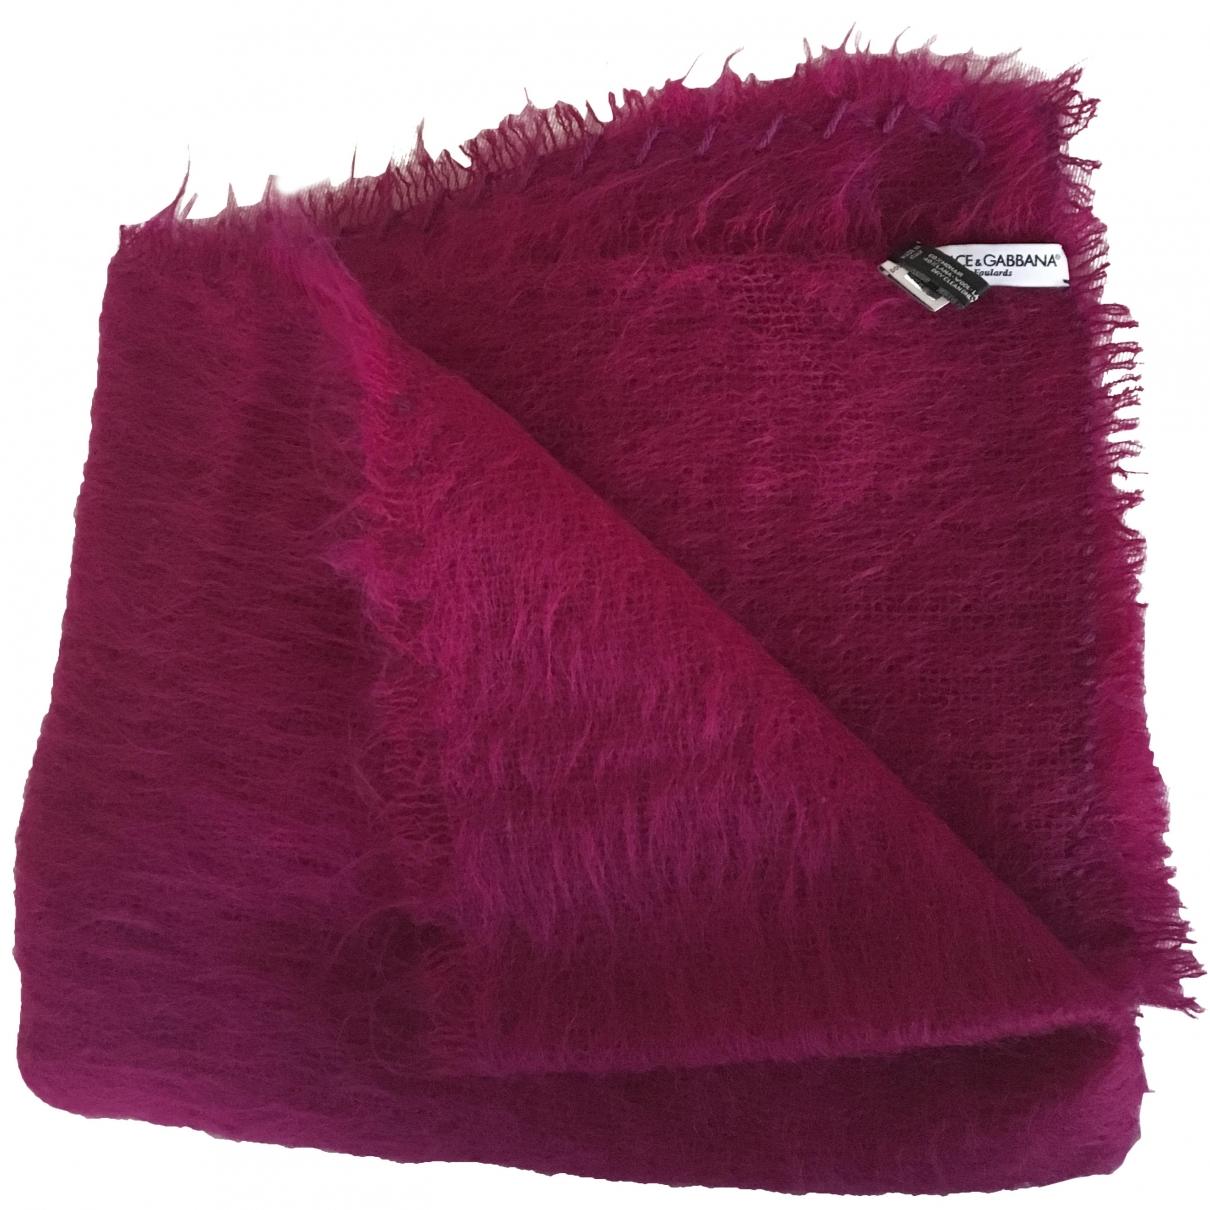 Dolce & Gabbana \N Wool scarf for Women \N